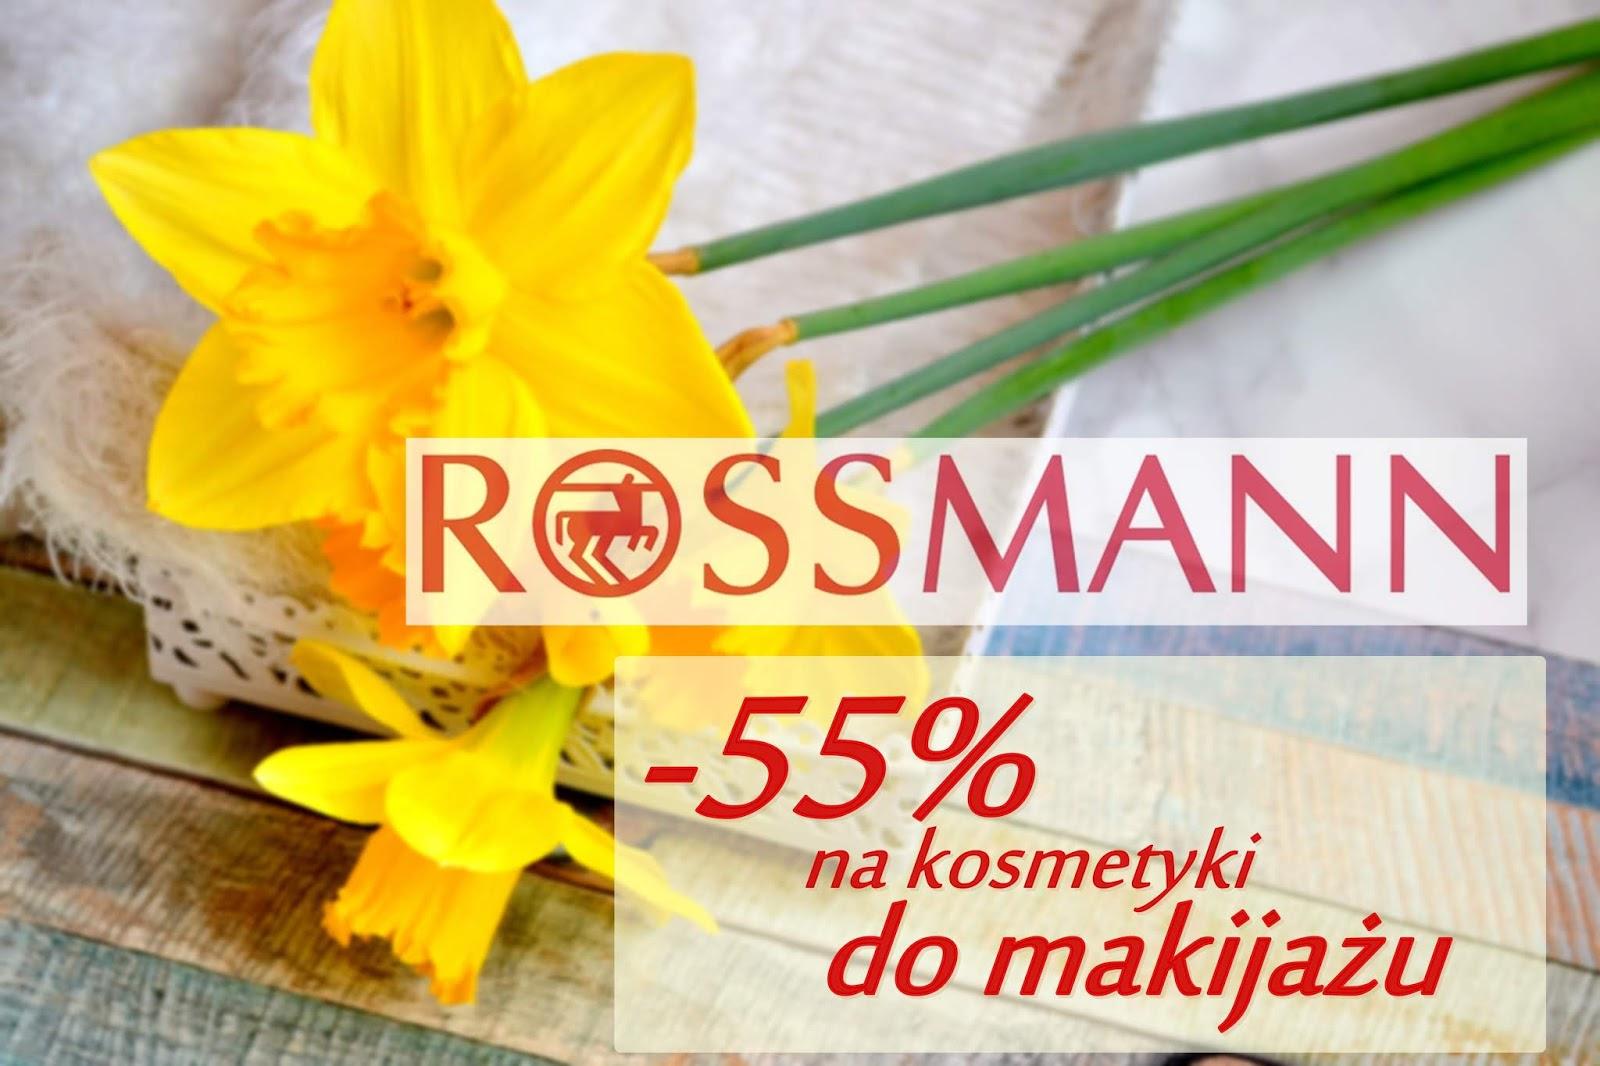 Rossmann -55% 9 październik 2018